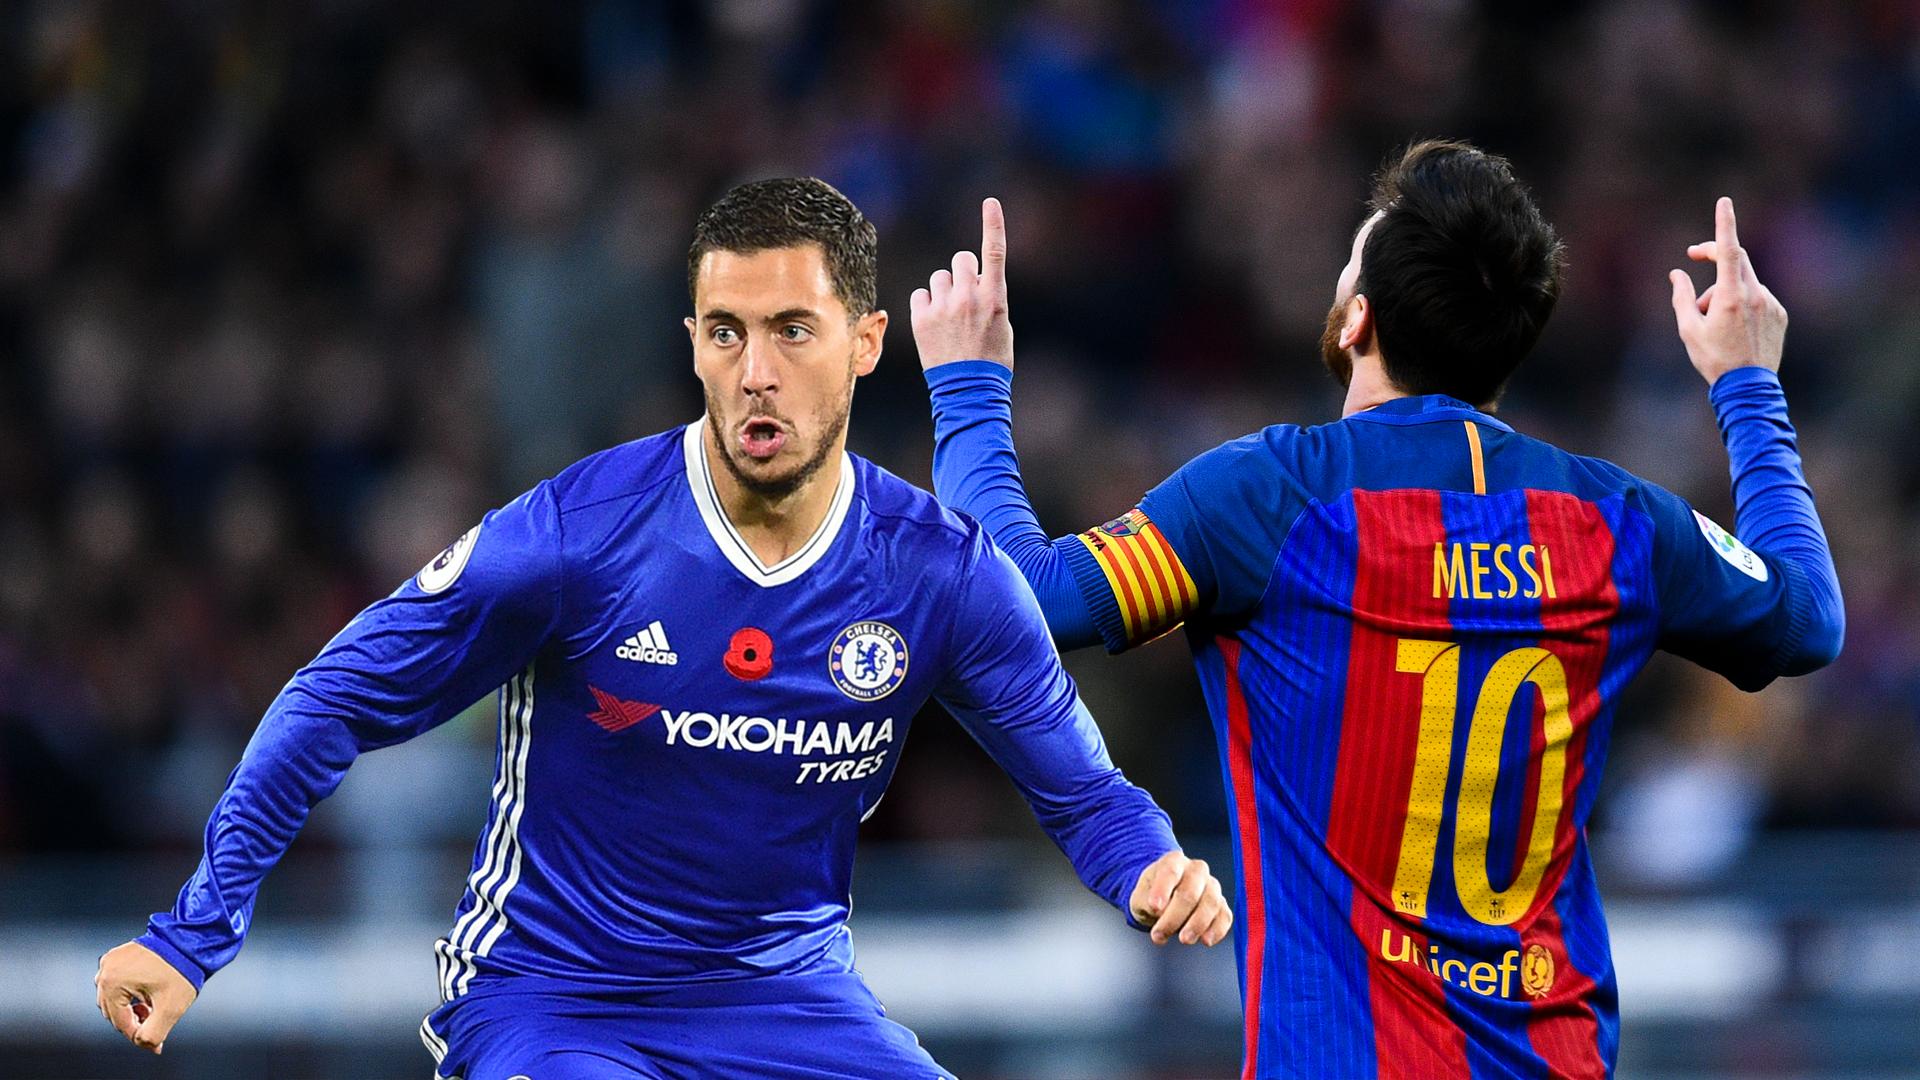 Jose Mourinho Annoyed By Praise Of Antonio Conte's Tactics At Chelsea